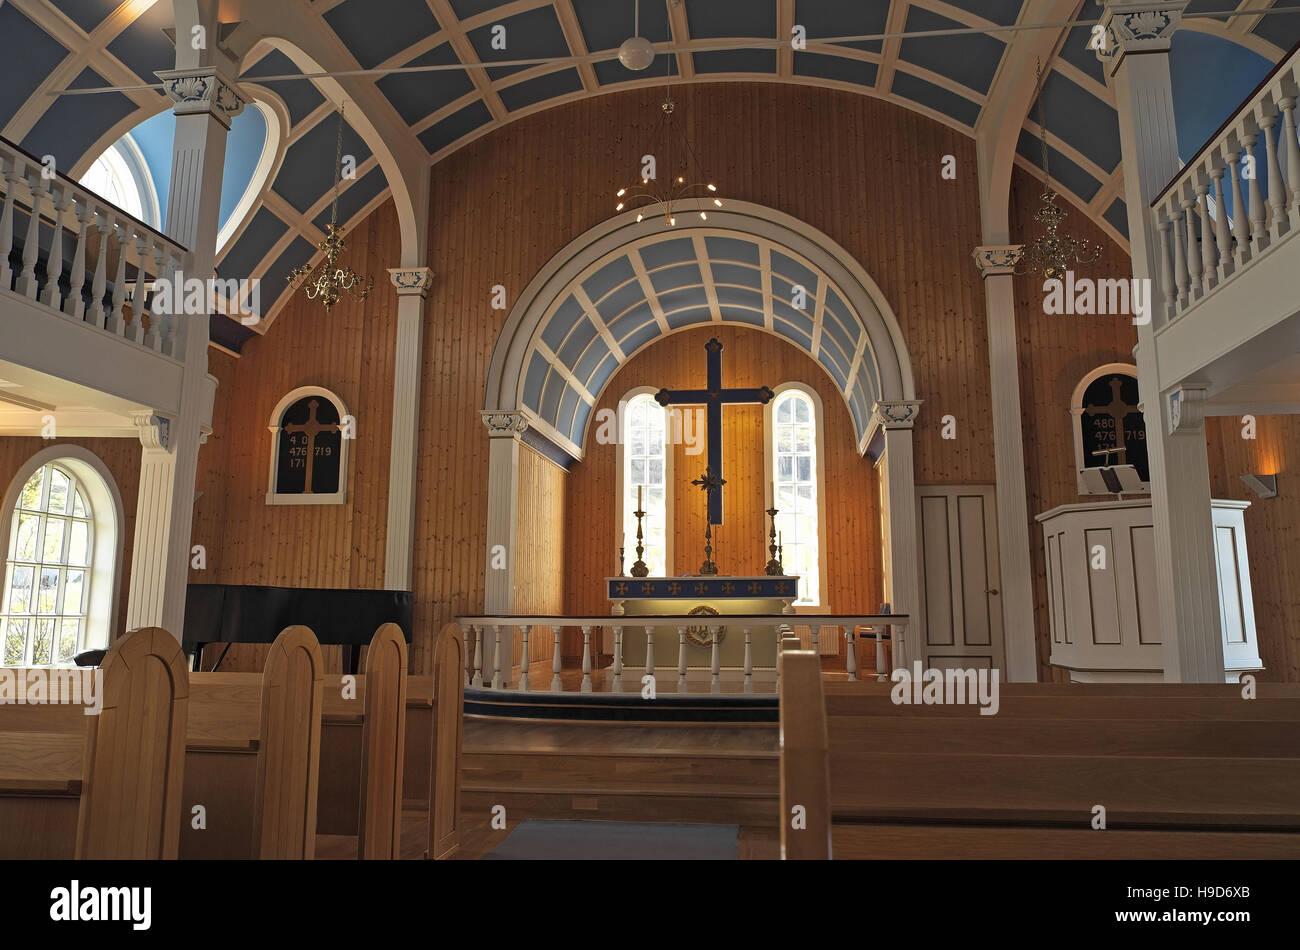 Interior of the Blue Church, Seydisfjordur, east Iceland. - Stock Image